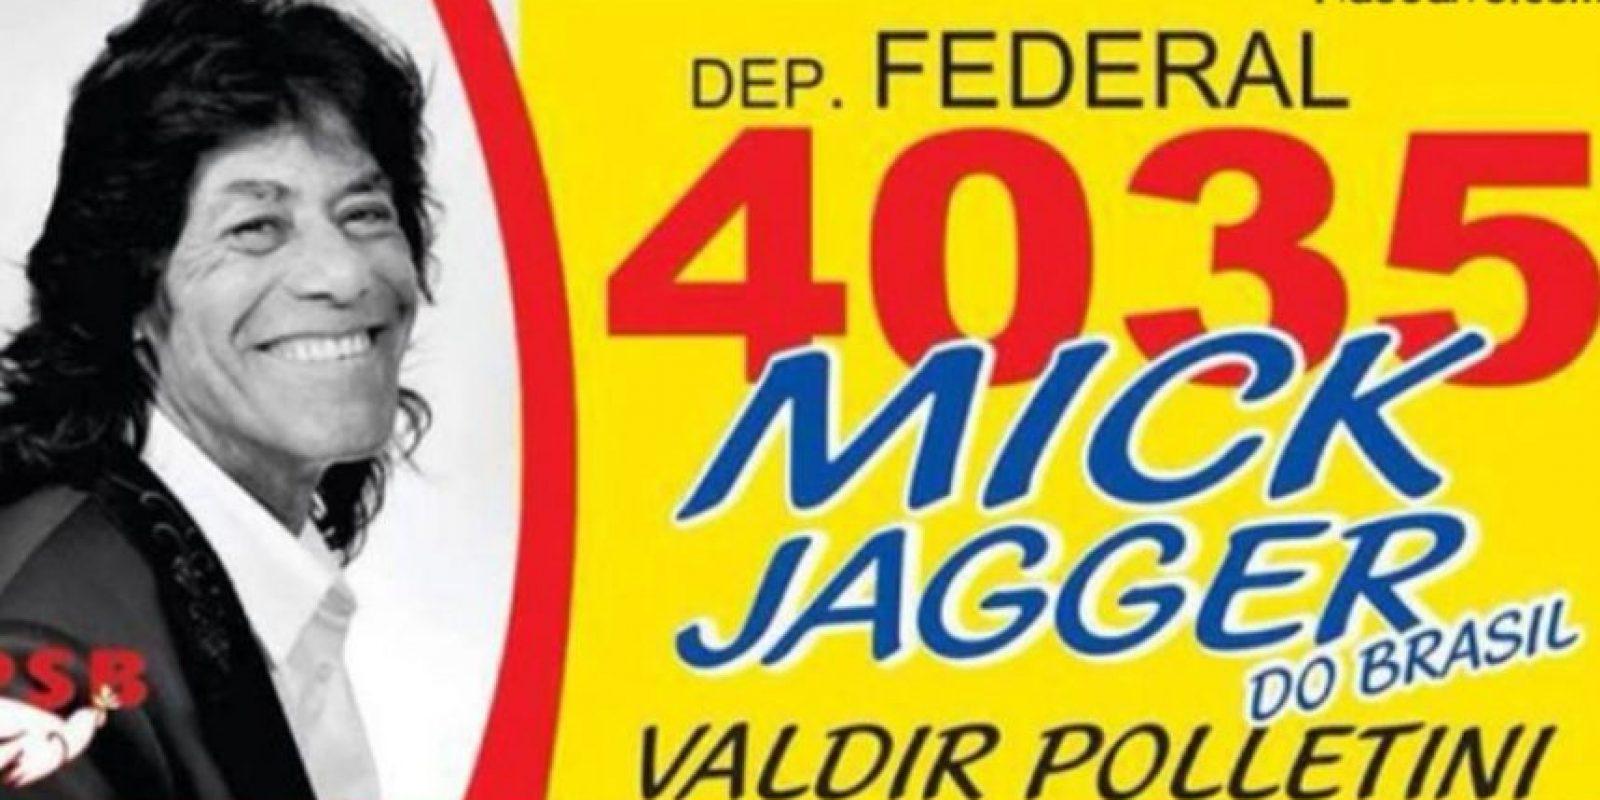 Algunos son imitadores, otros buscan hacerse fama con un nombre o apodo famoso Foto:Naosalvo.com.br